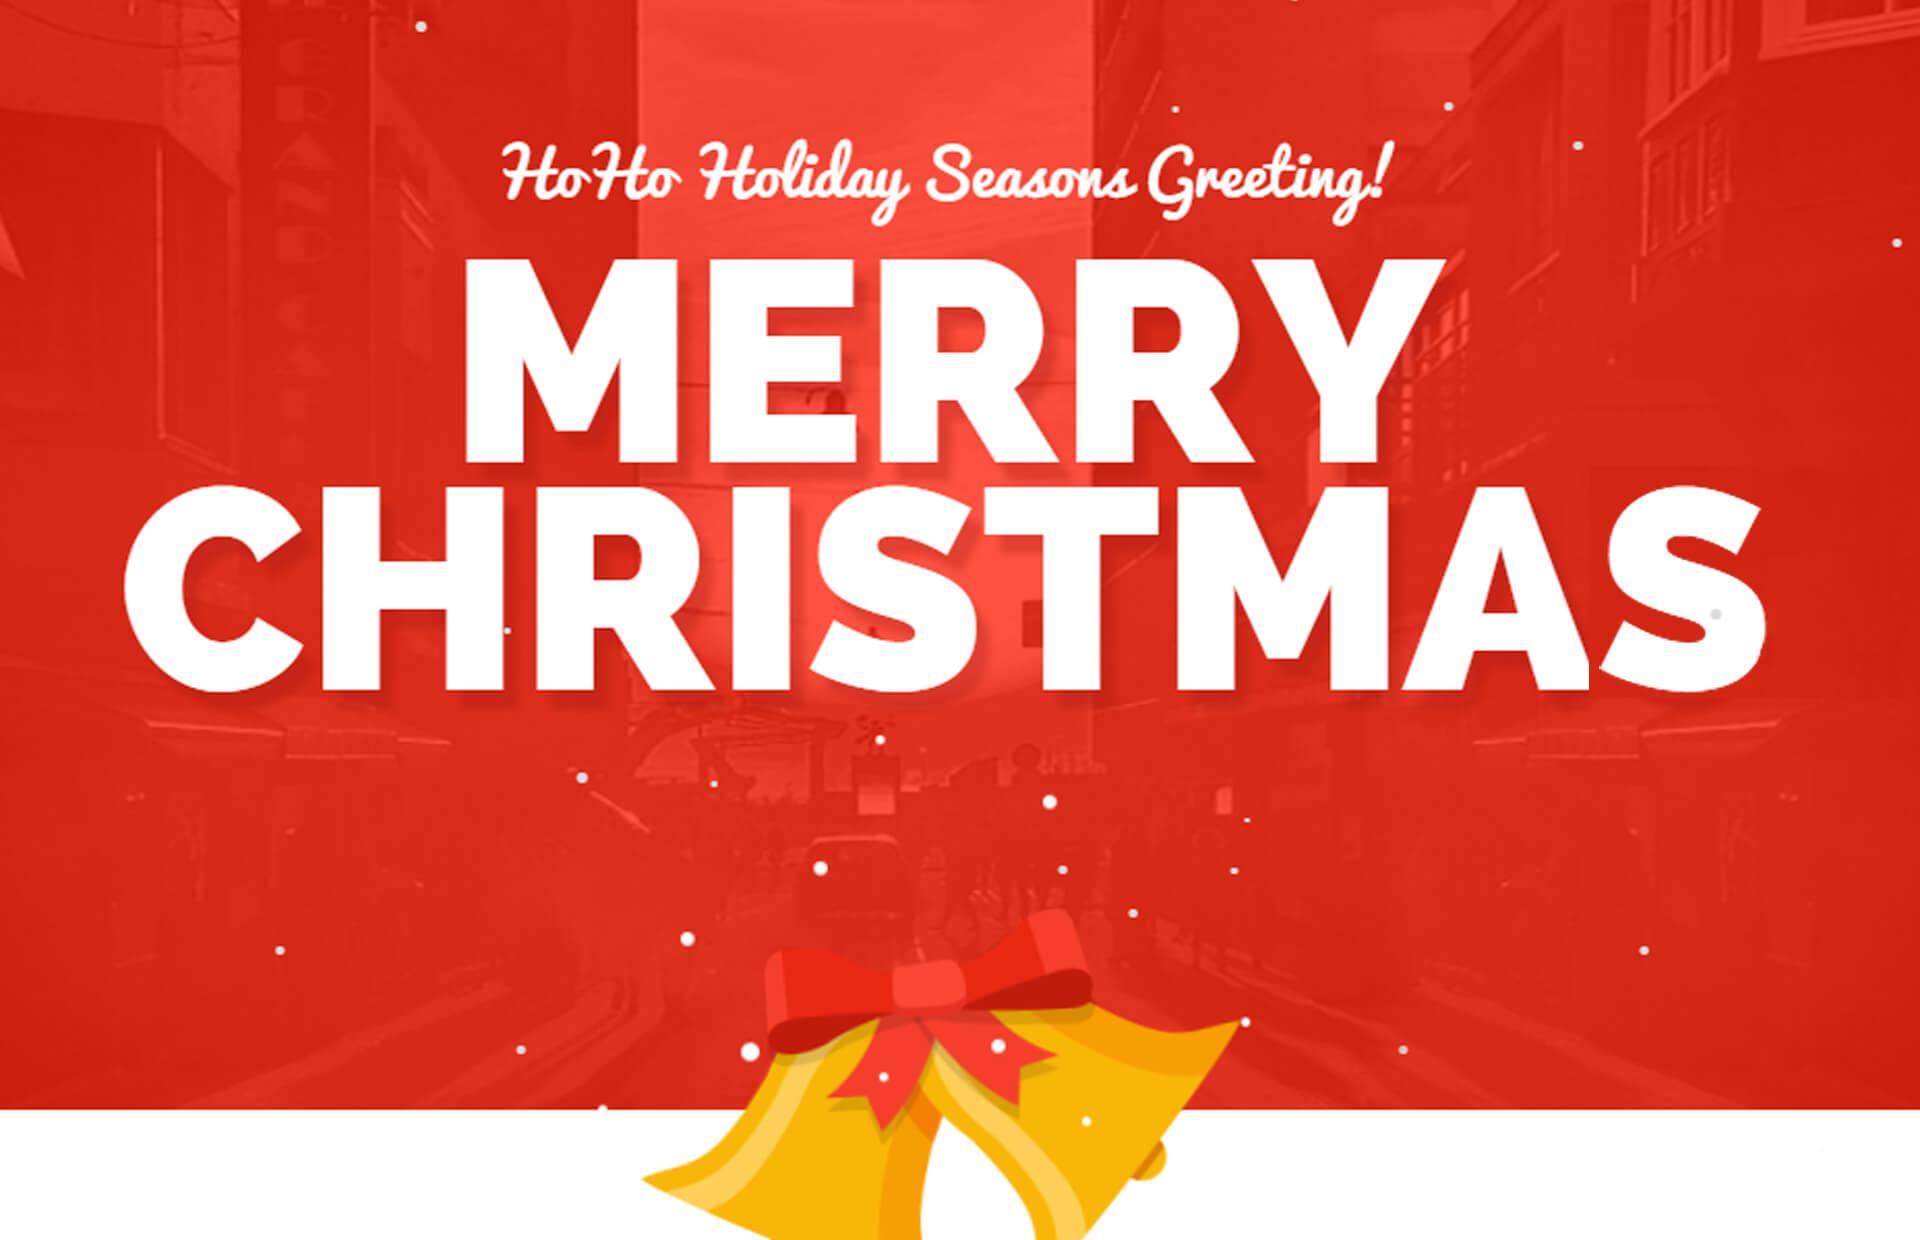 Merry Christmas & Season's Greetings From Semak